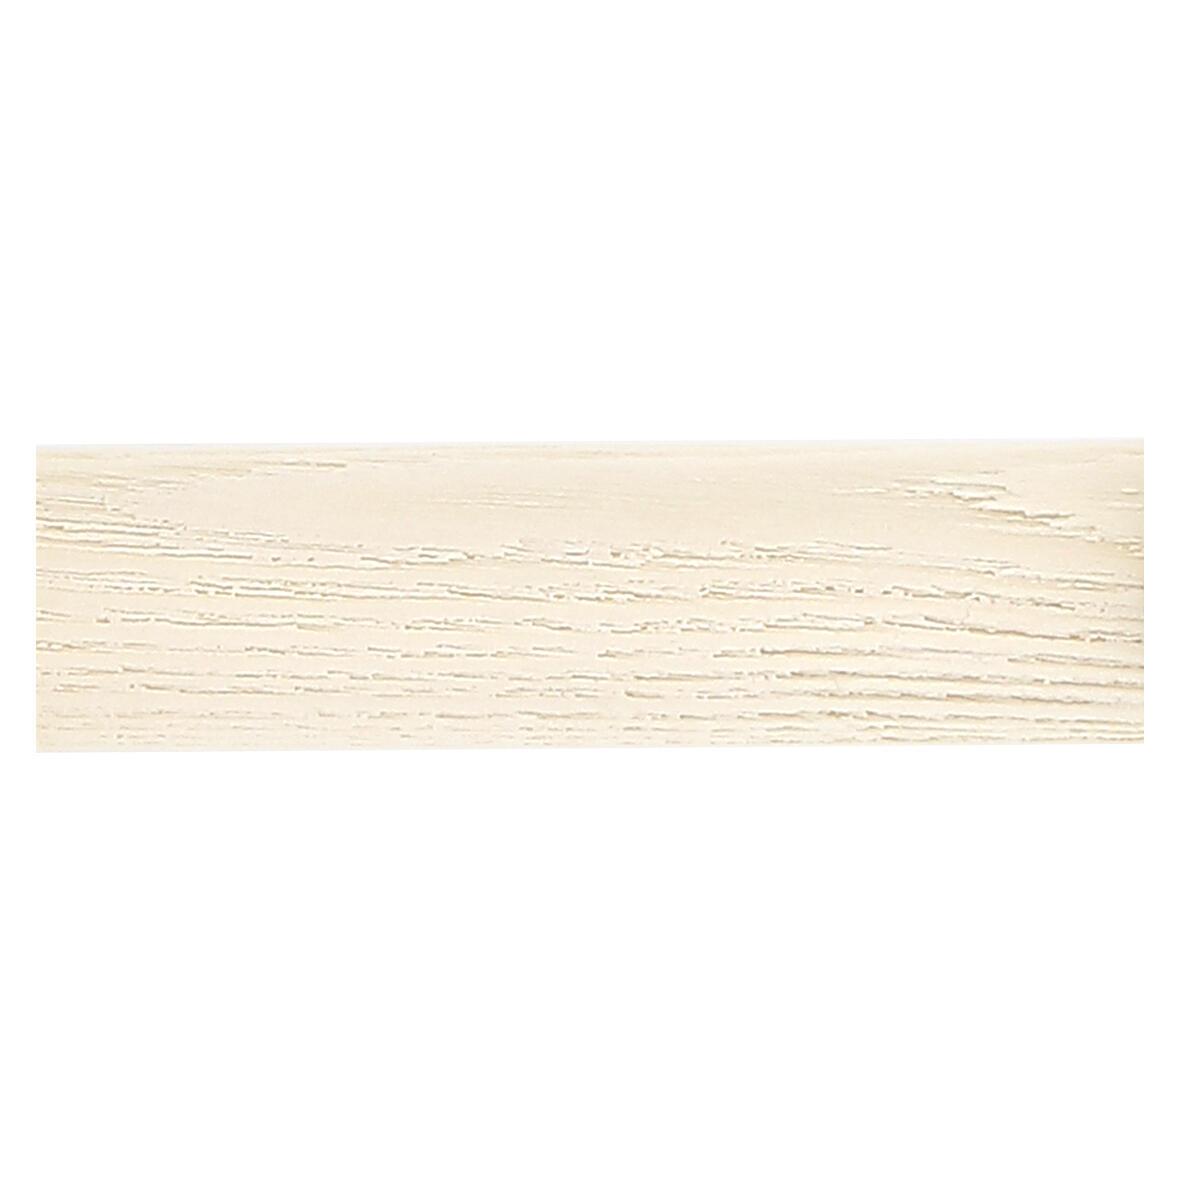 Bastone per tenda Boheme in frassino Ø 28 mm sabbia sbiancato 250 cm - 2